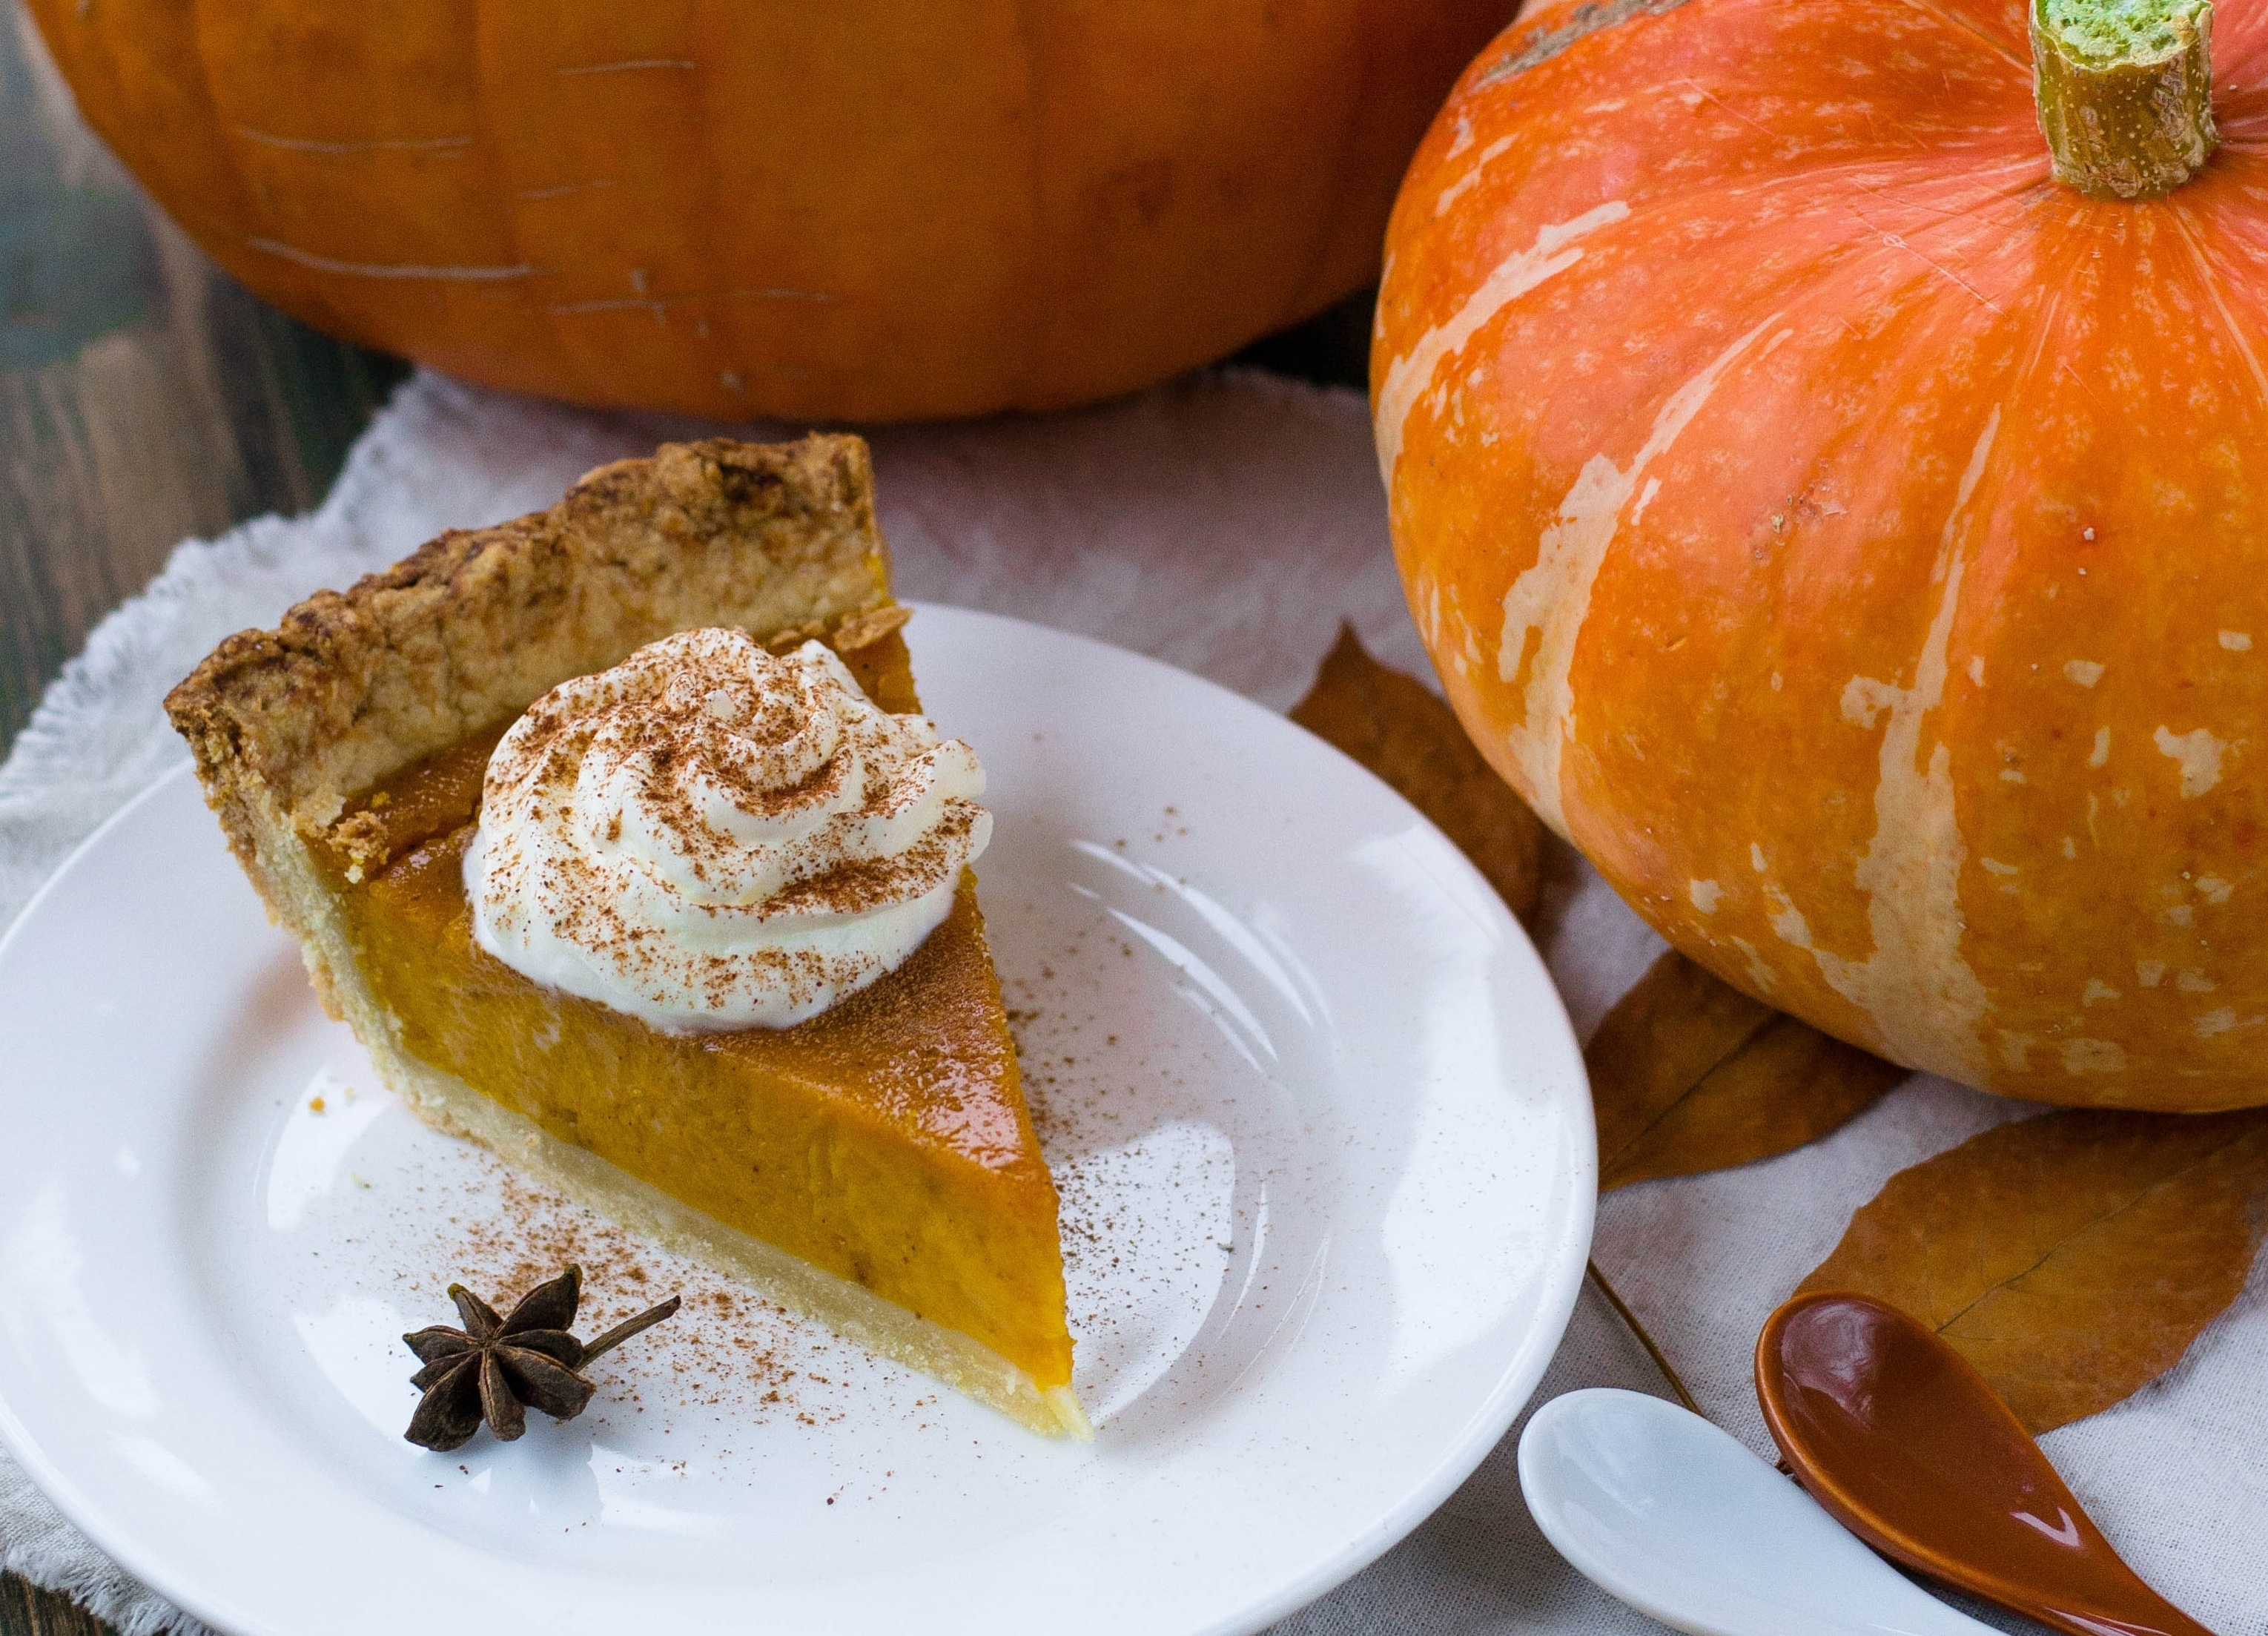 holiday-food-pumpkin-pie-709945-edited.jpeg